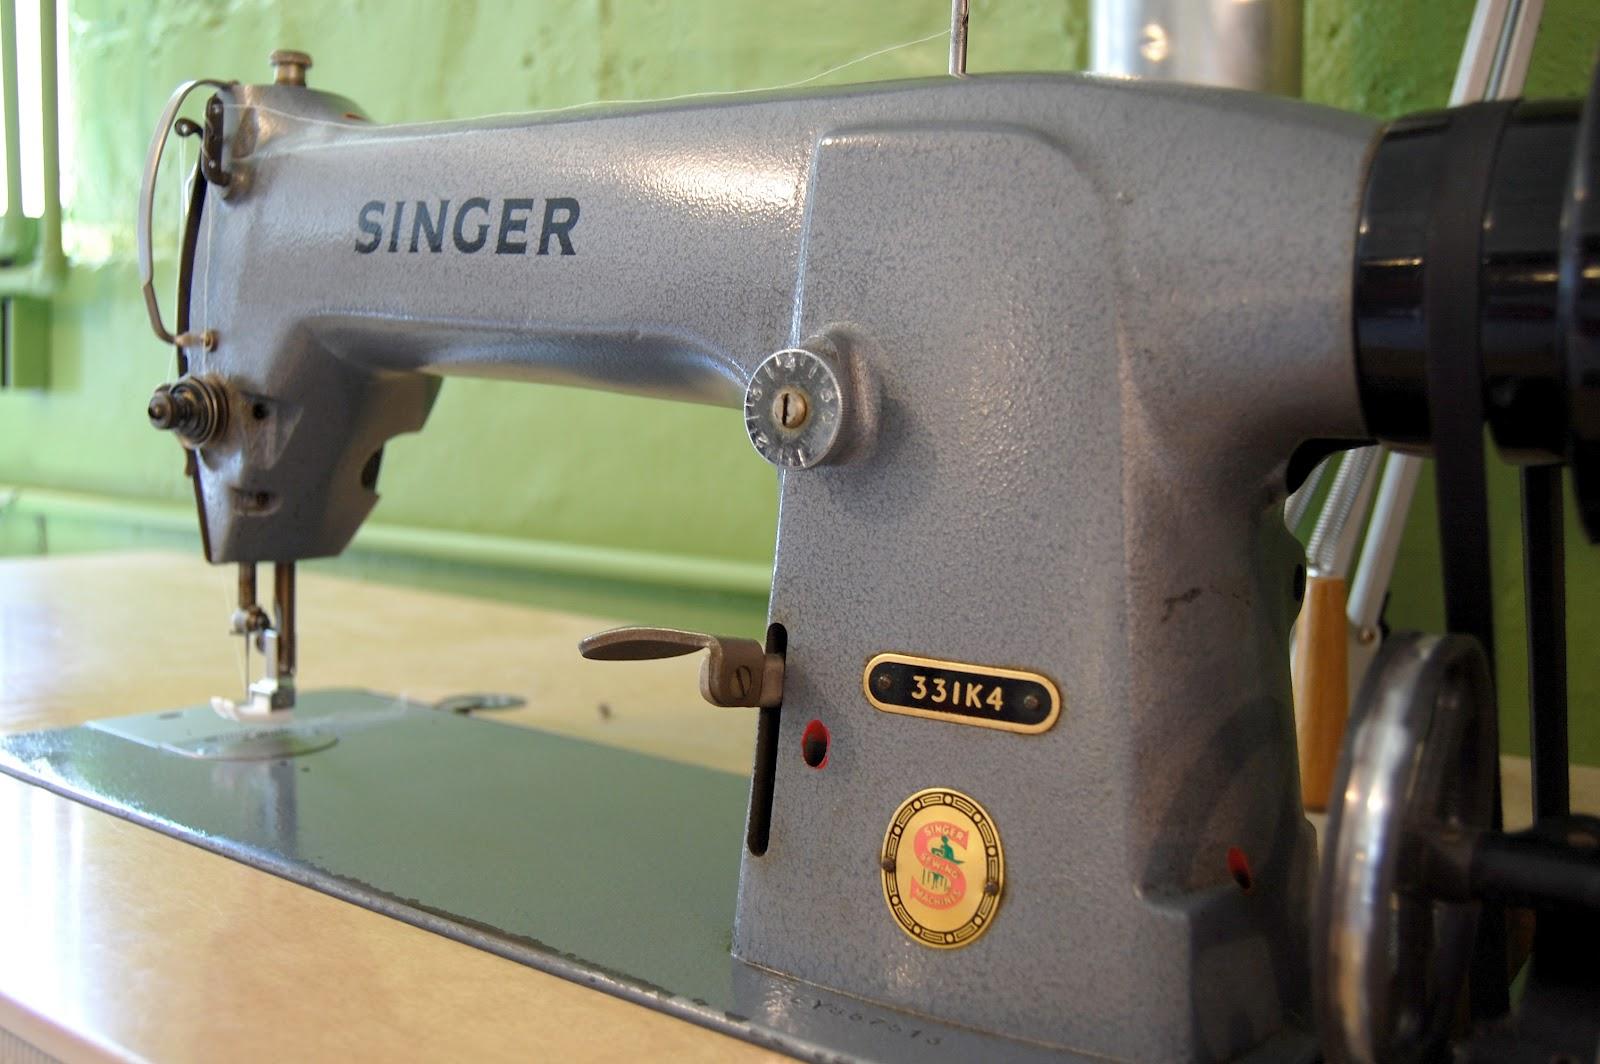 Miss sews it all: use it or lose it: 1966 singer 331k4